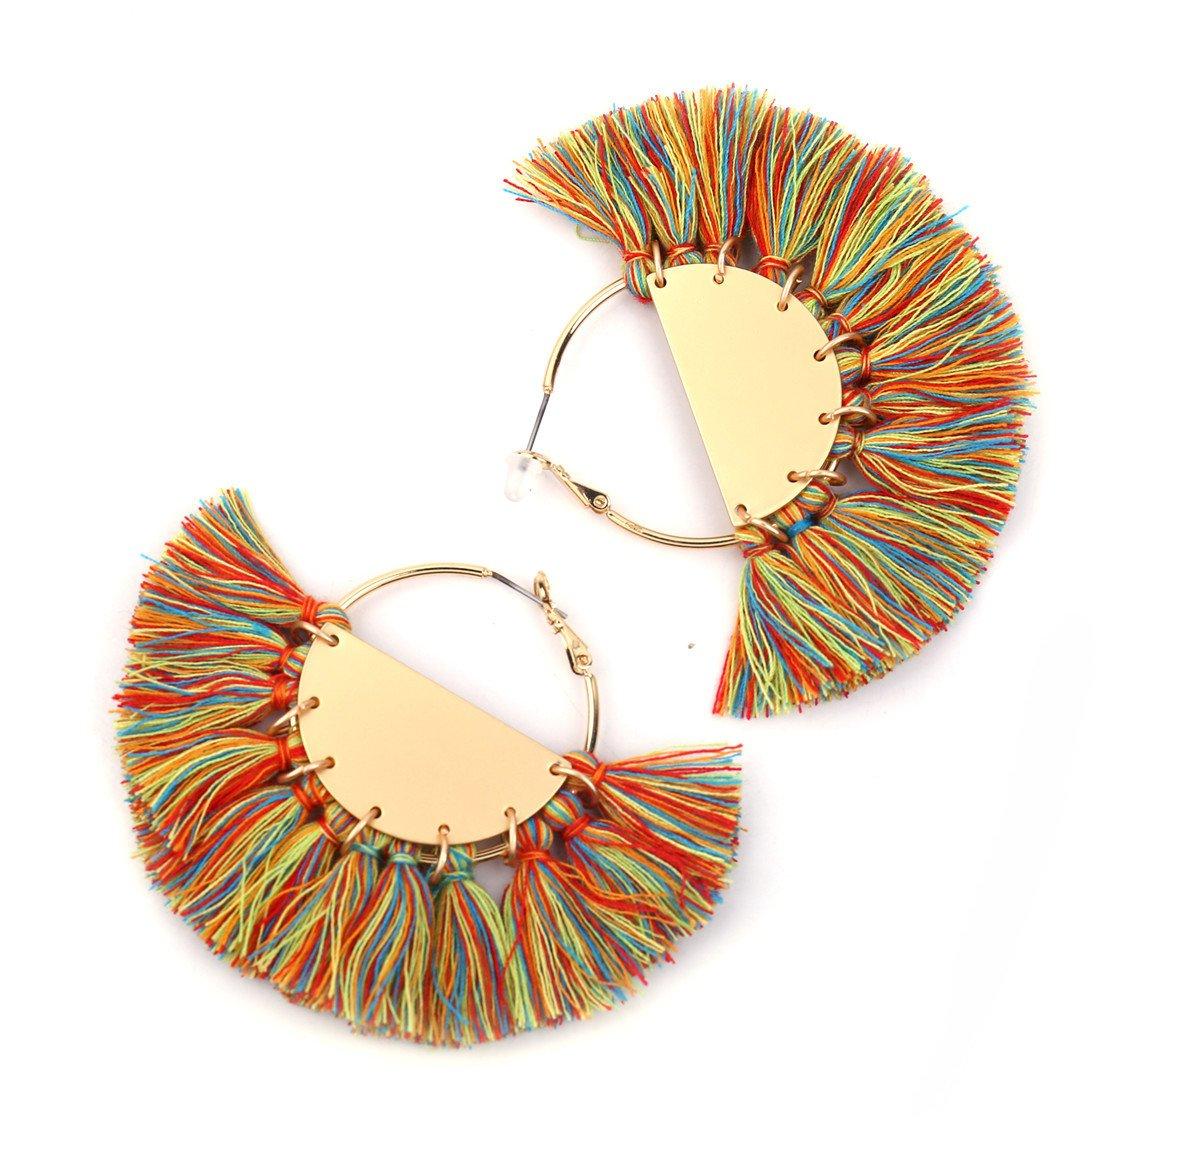 Badu Tassel Earrings for Women and Girl Rainbow Color Tassels Earring Gold Hoop Summer Jewelry (Color)